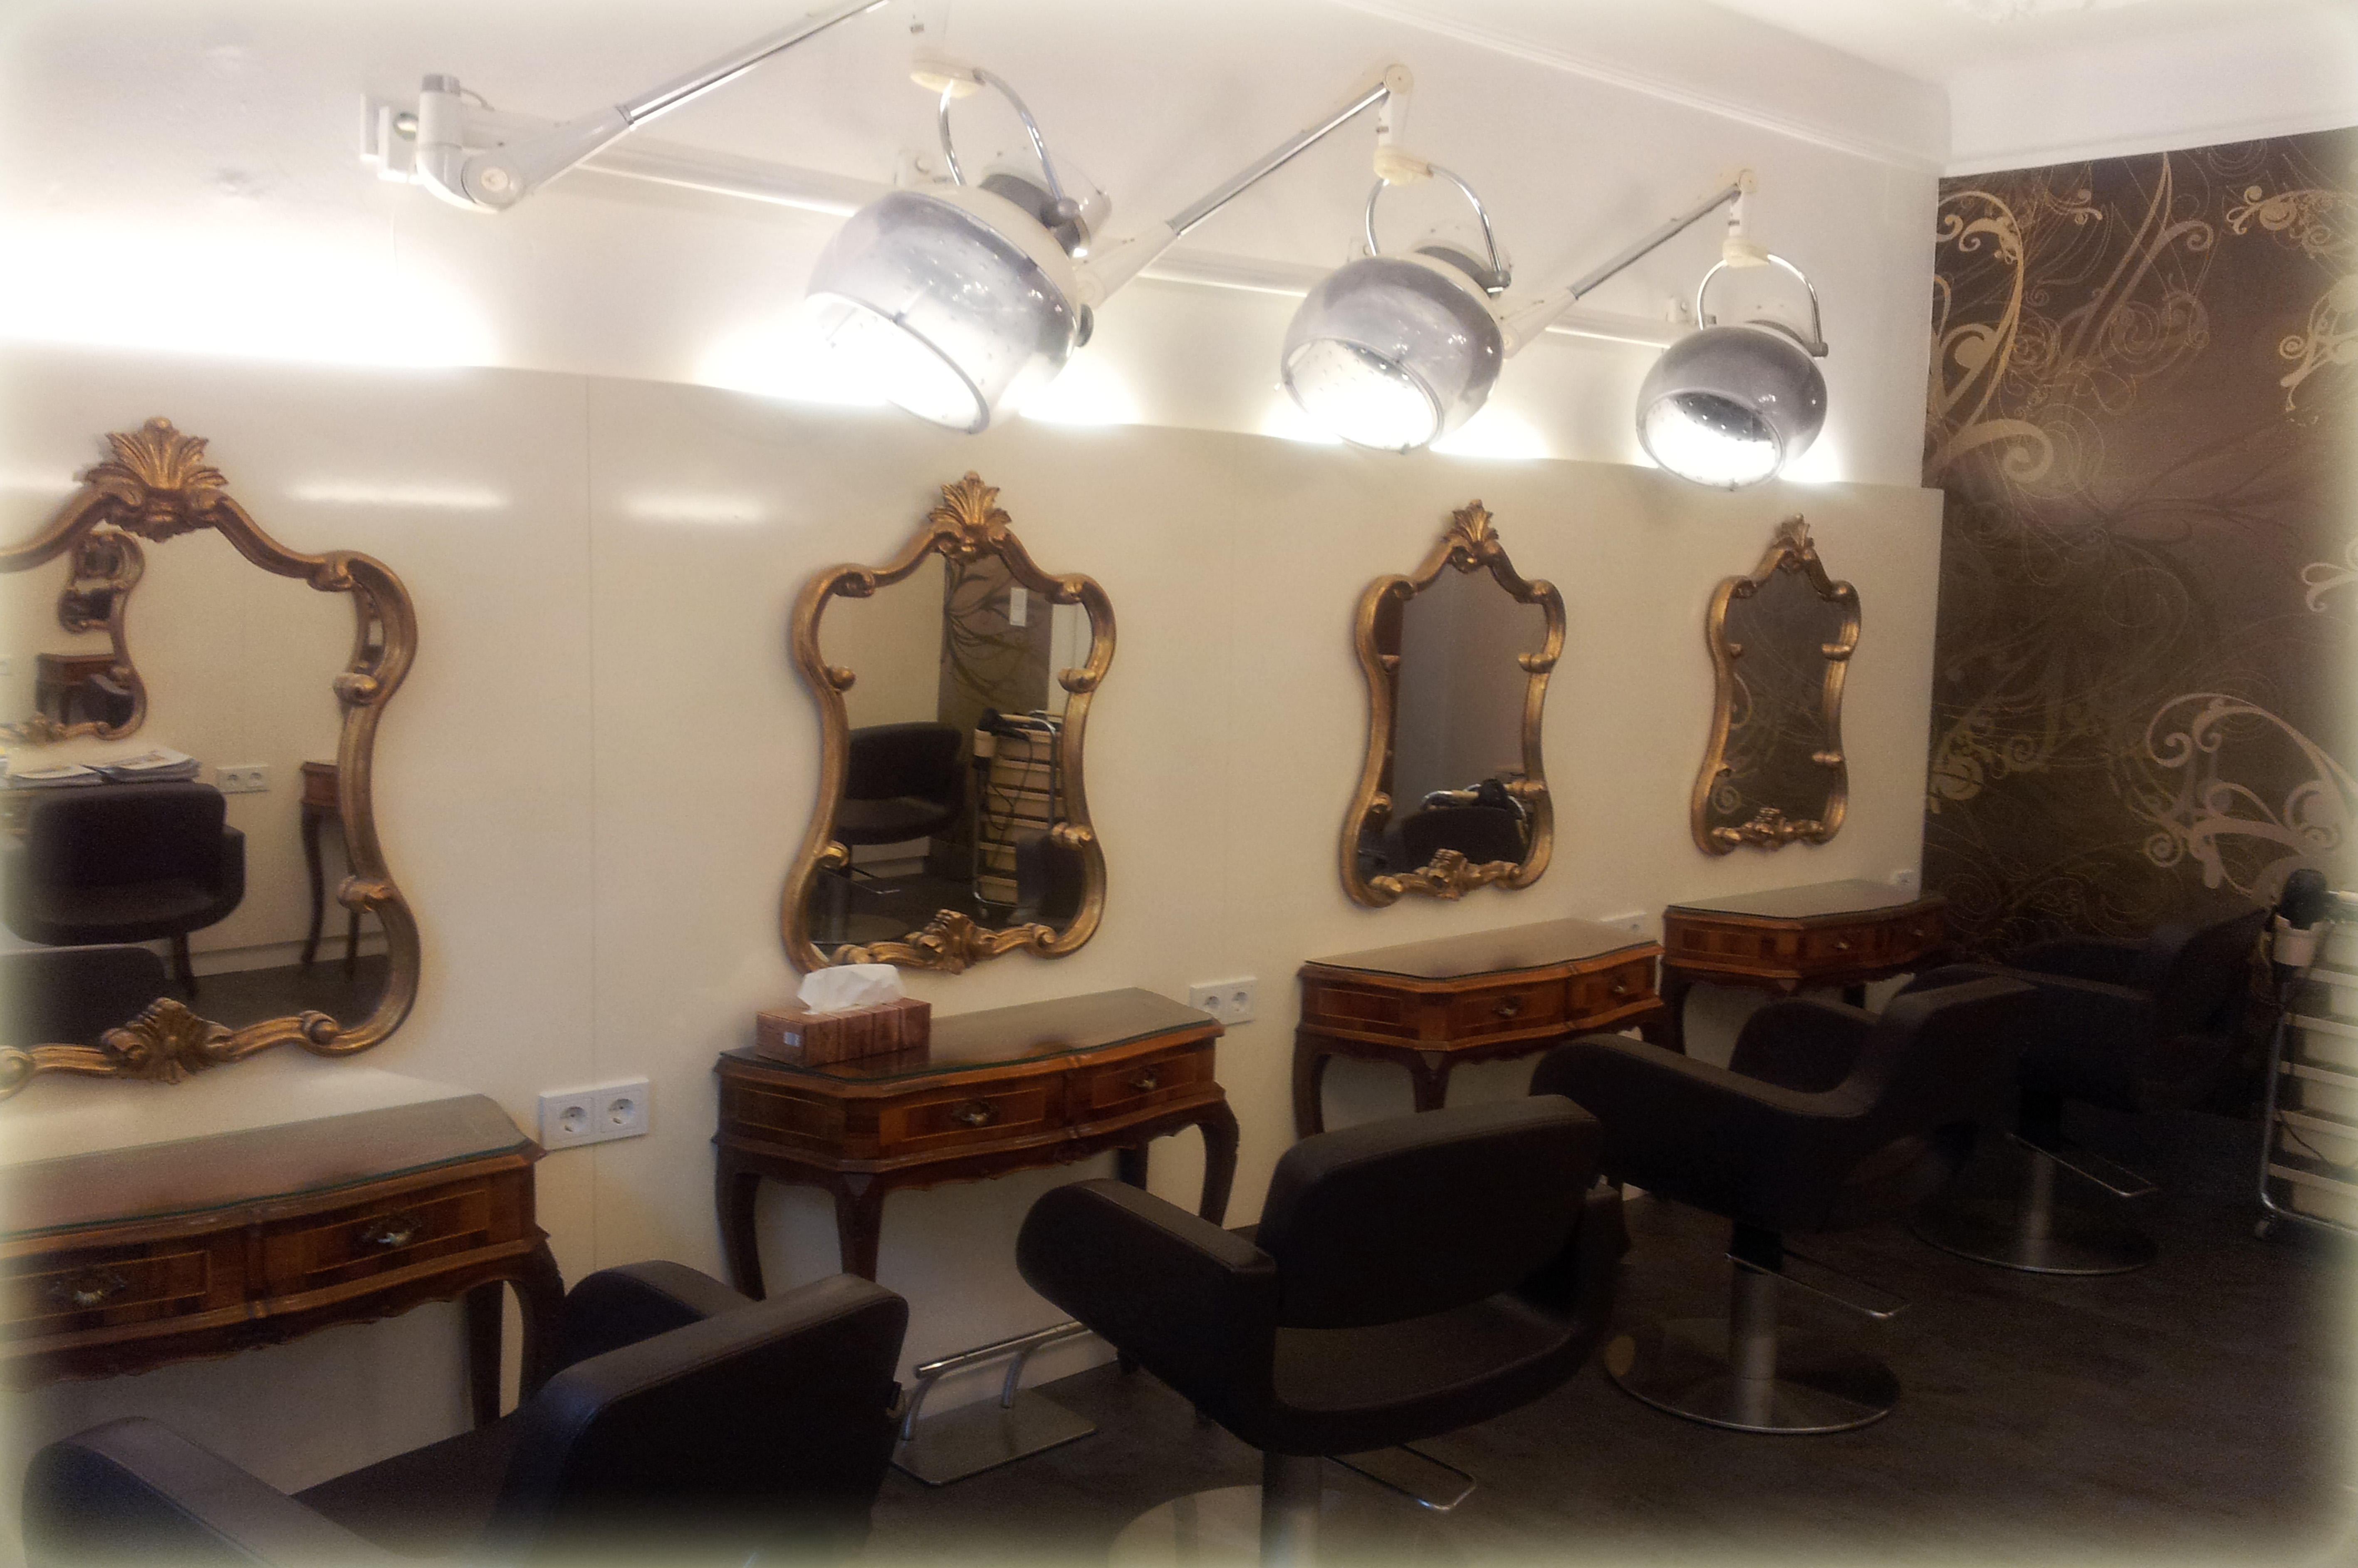 Salon 1130 weich Kopie - Kopie